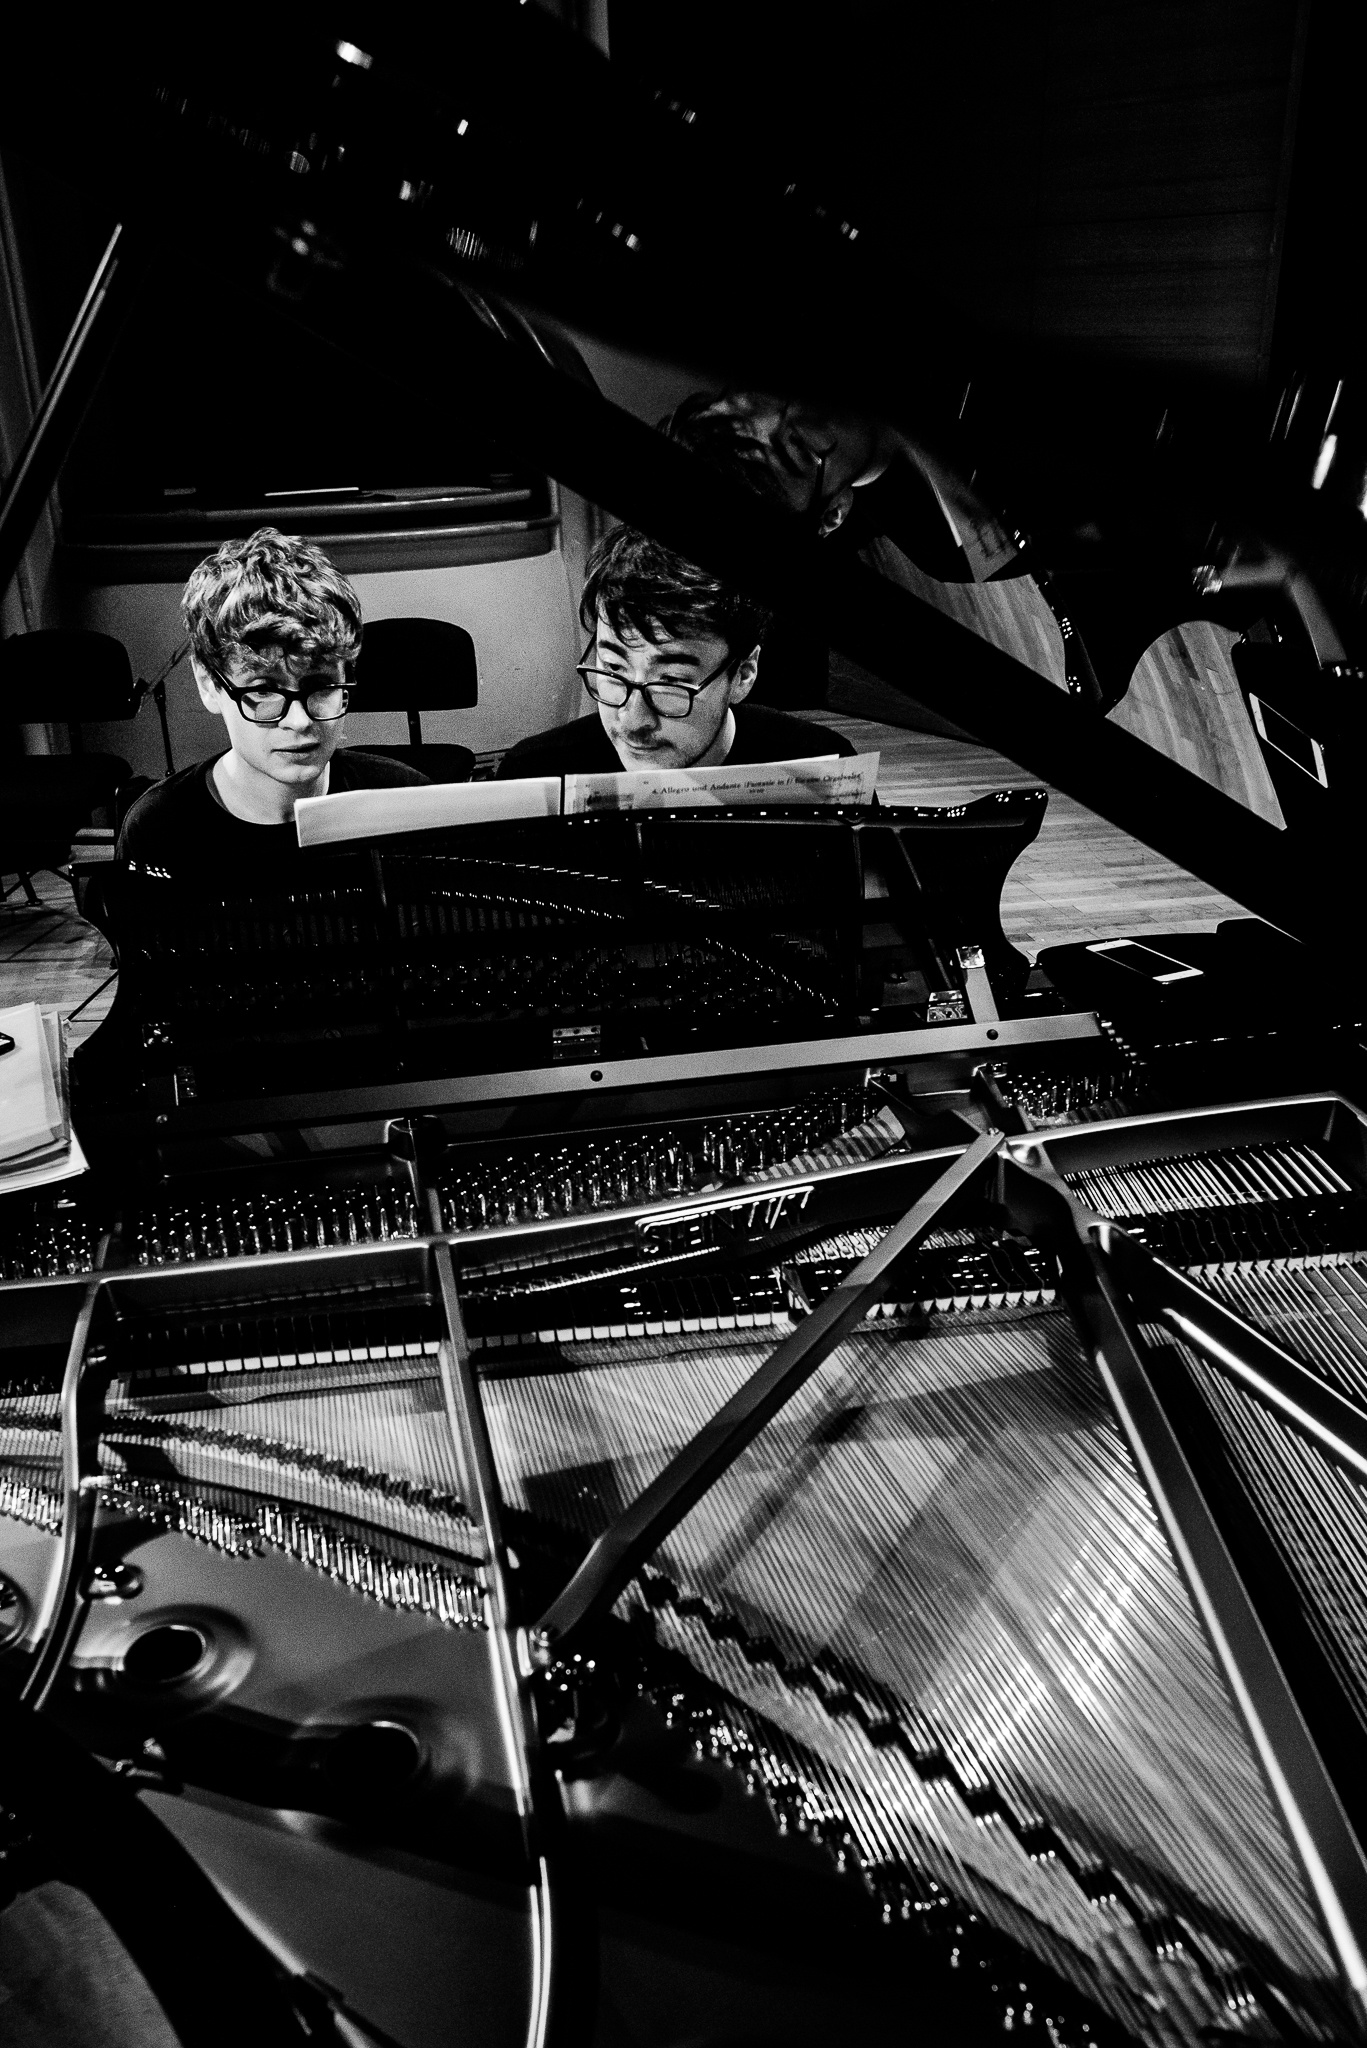 CONCERT - GABY MERZ, circus photography